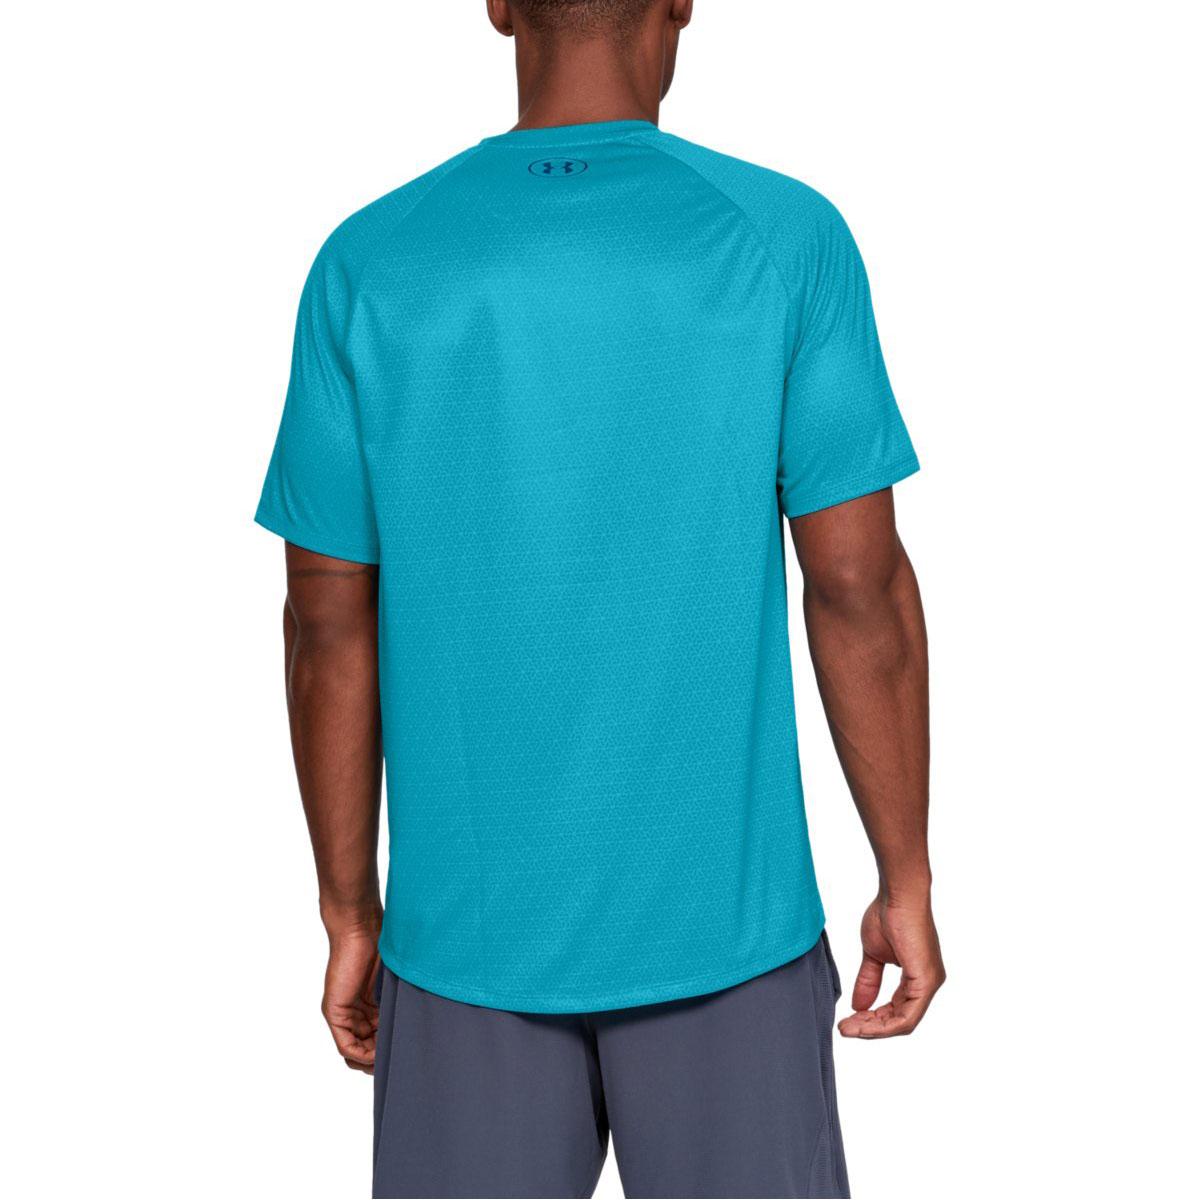 Under-Armour-Mens-UA-Tech-SS-Printed-Moisture-Wicking-T-Shirt-Tee-27-OFF-RRP thumbnail 11